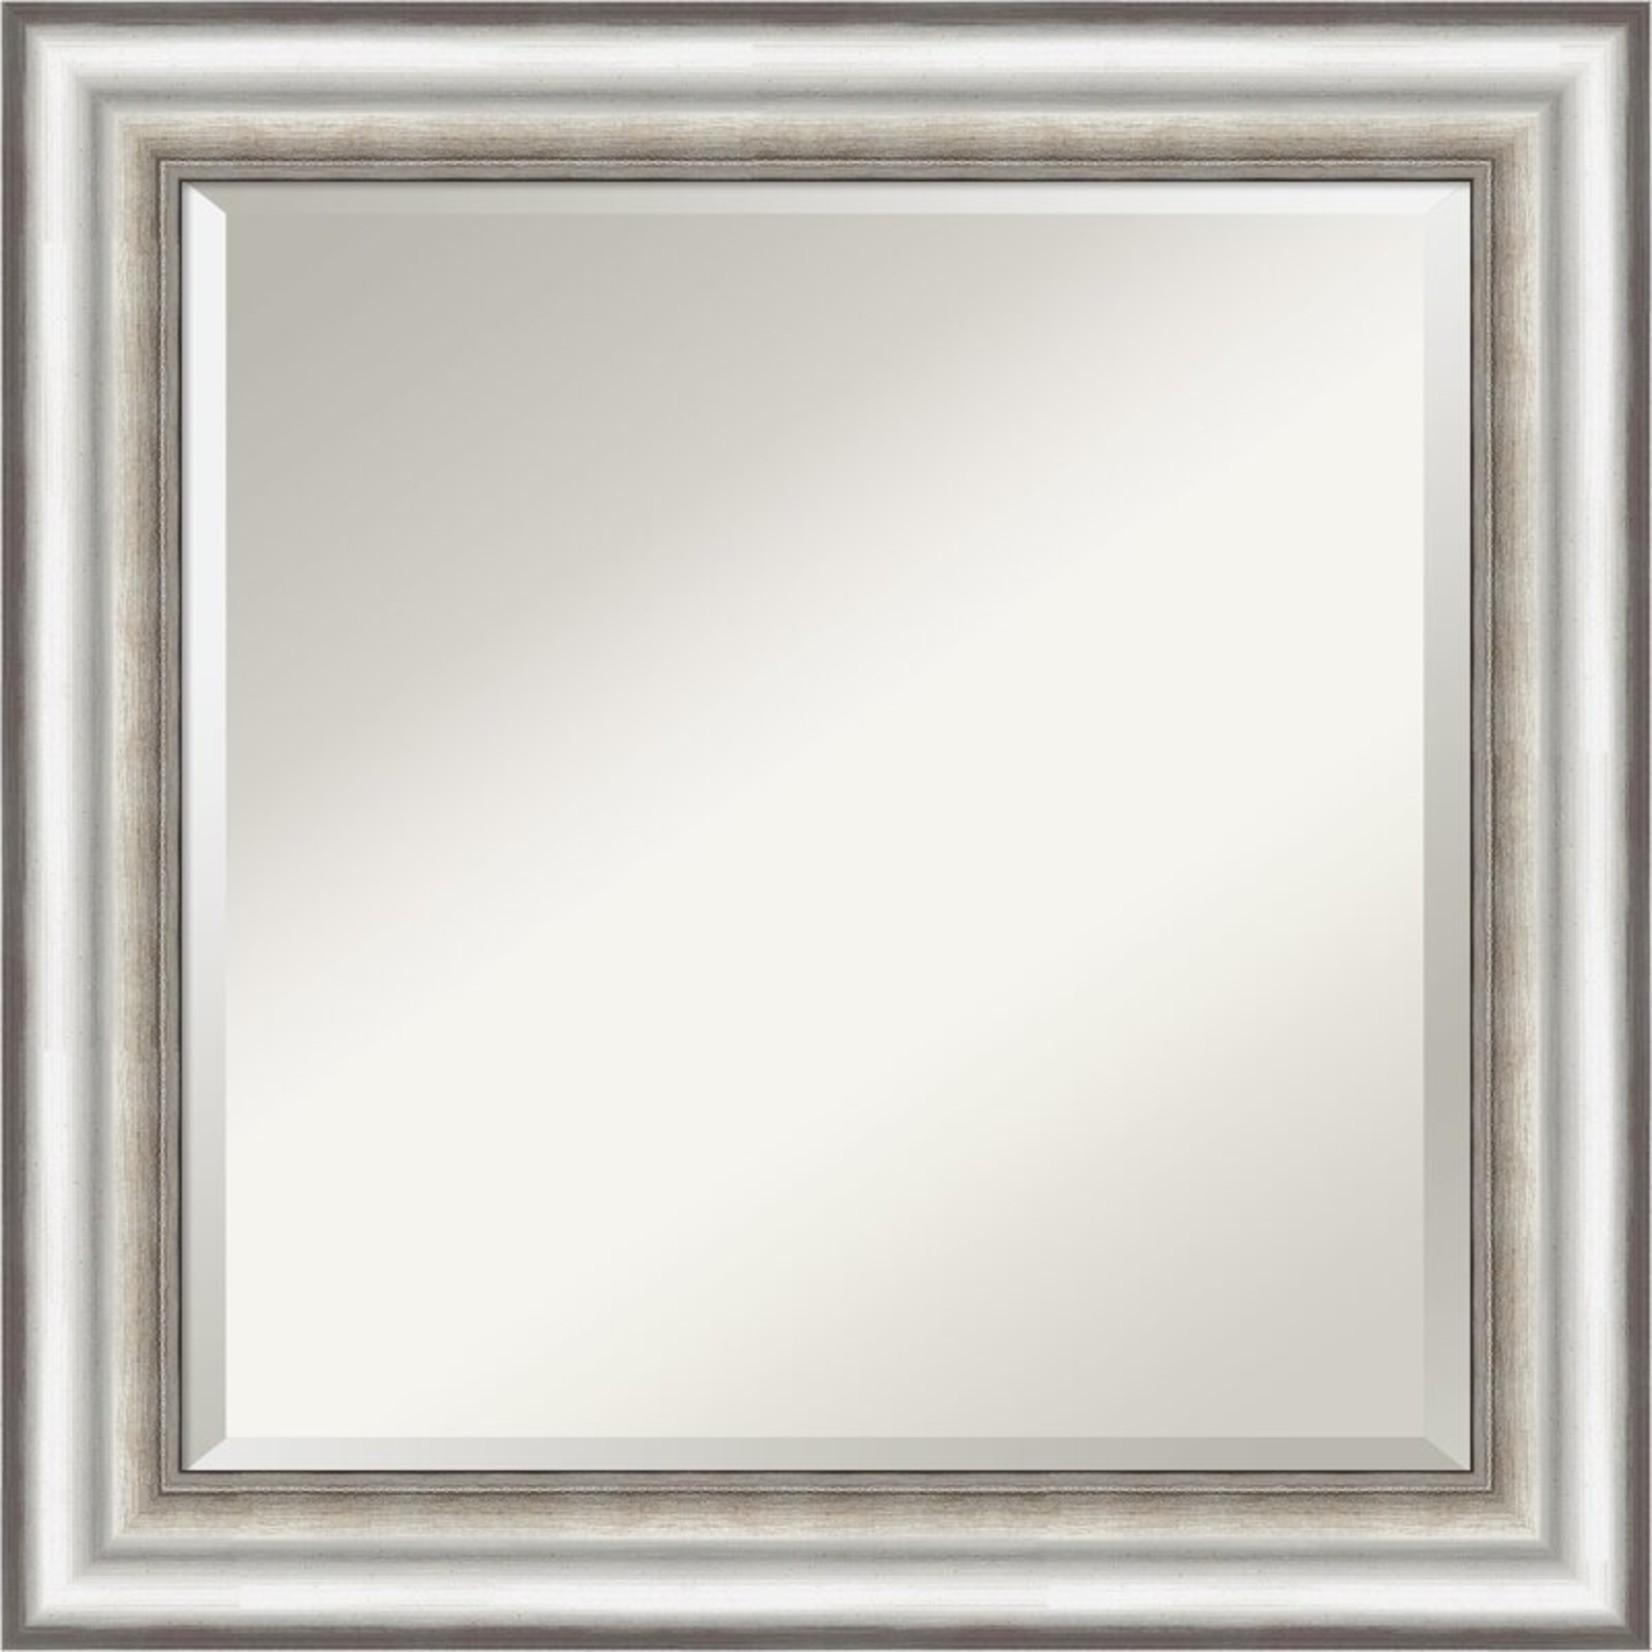 "*Trumpeters Traditional Beveled Bathroom/Vanity Wall Mirror - 25"" x 25"""